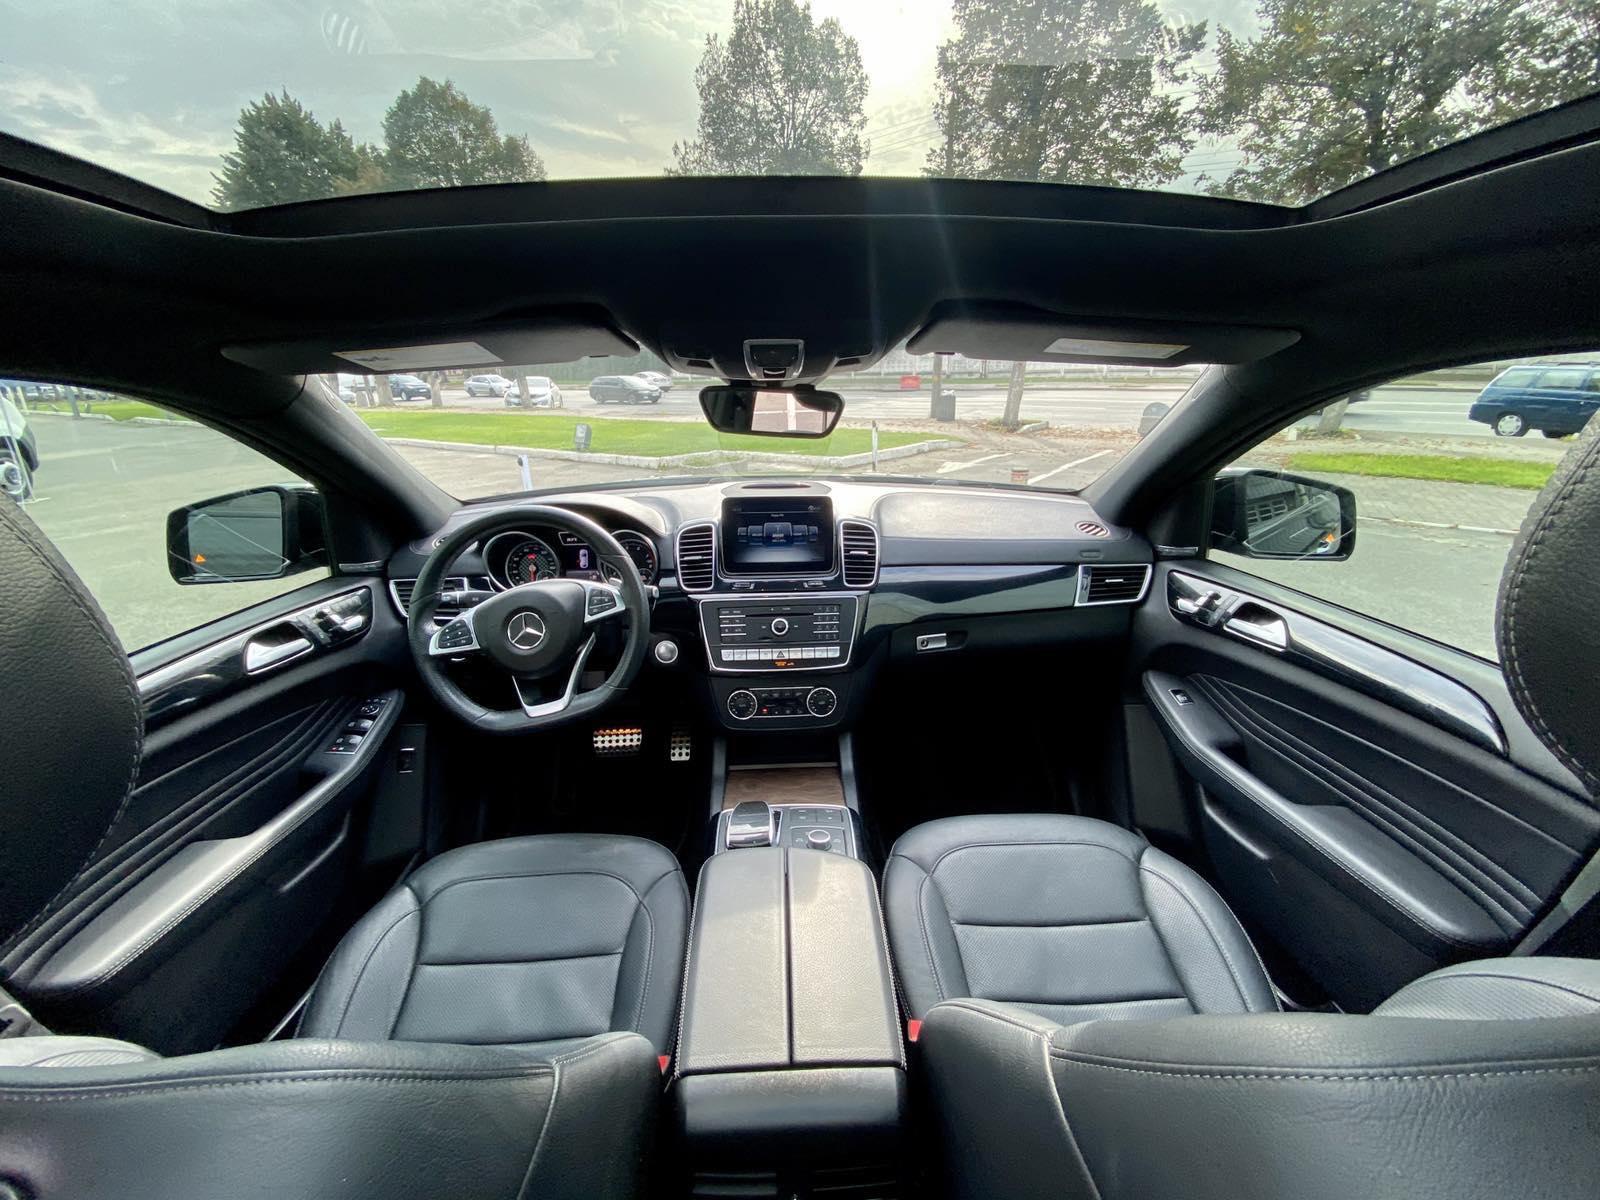 SUV Rental in Kyiv - Rent convertible in Kiev, rent sports car in Kiev (1)